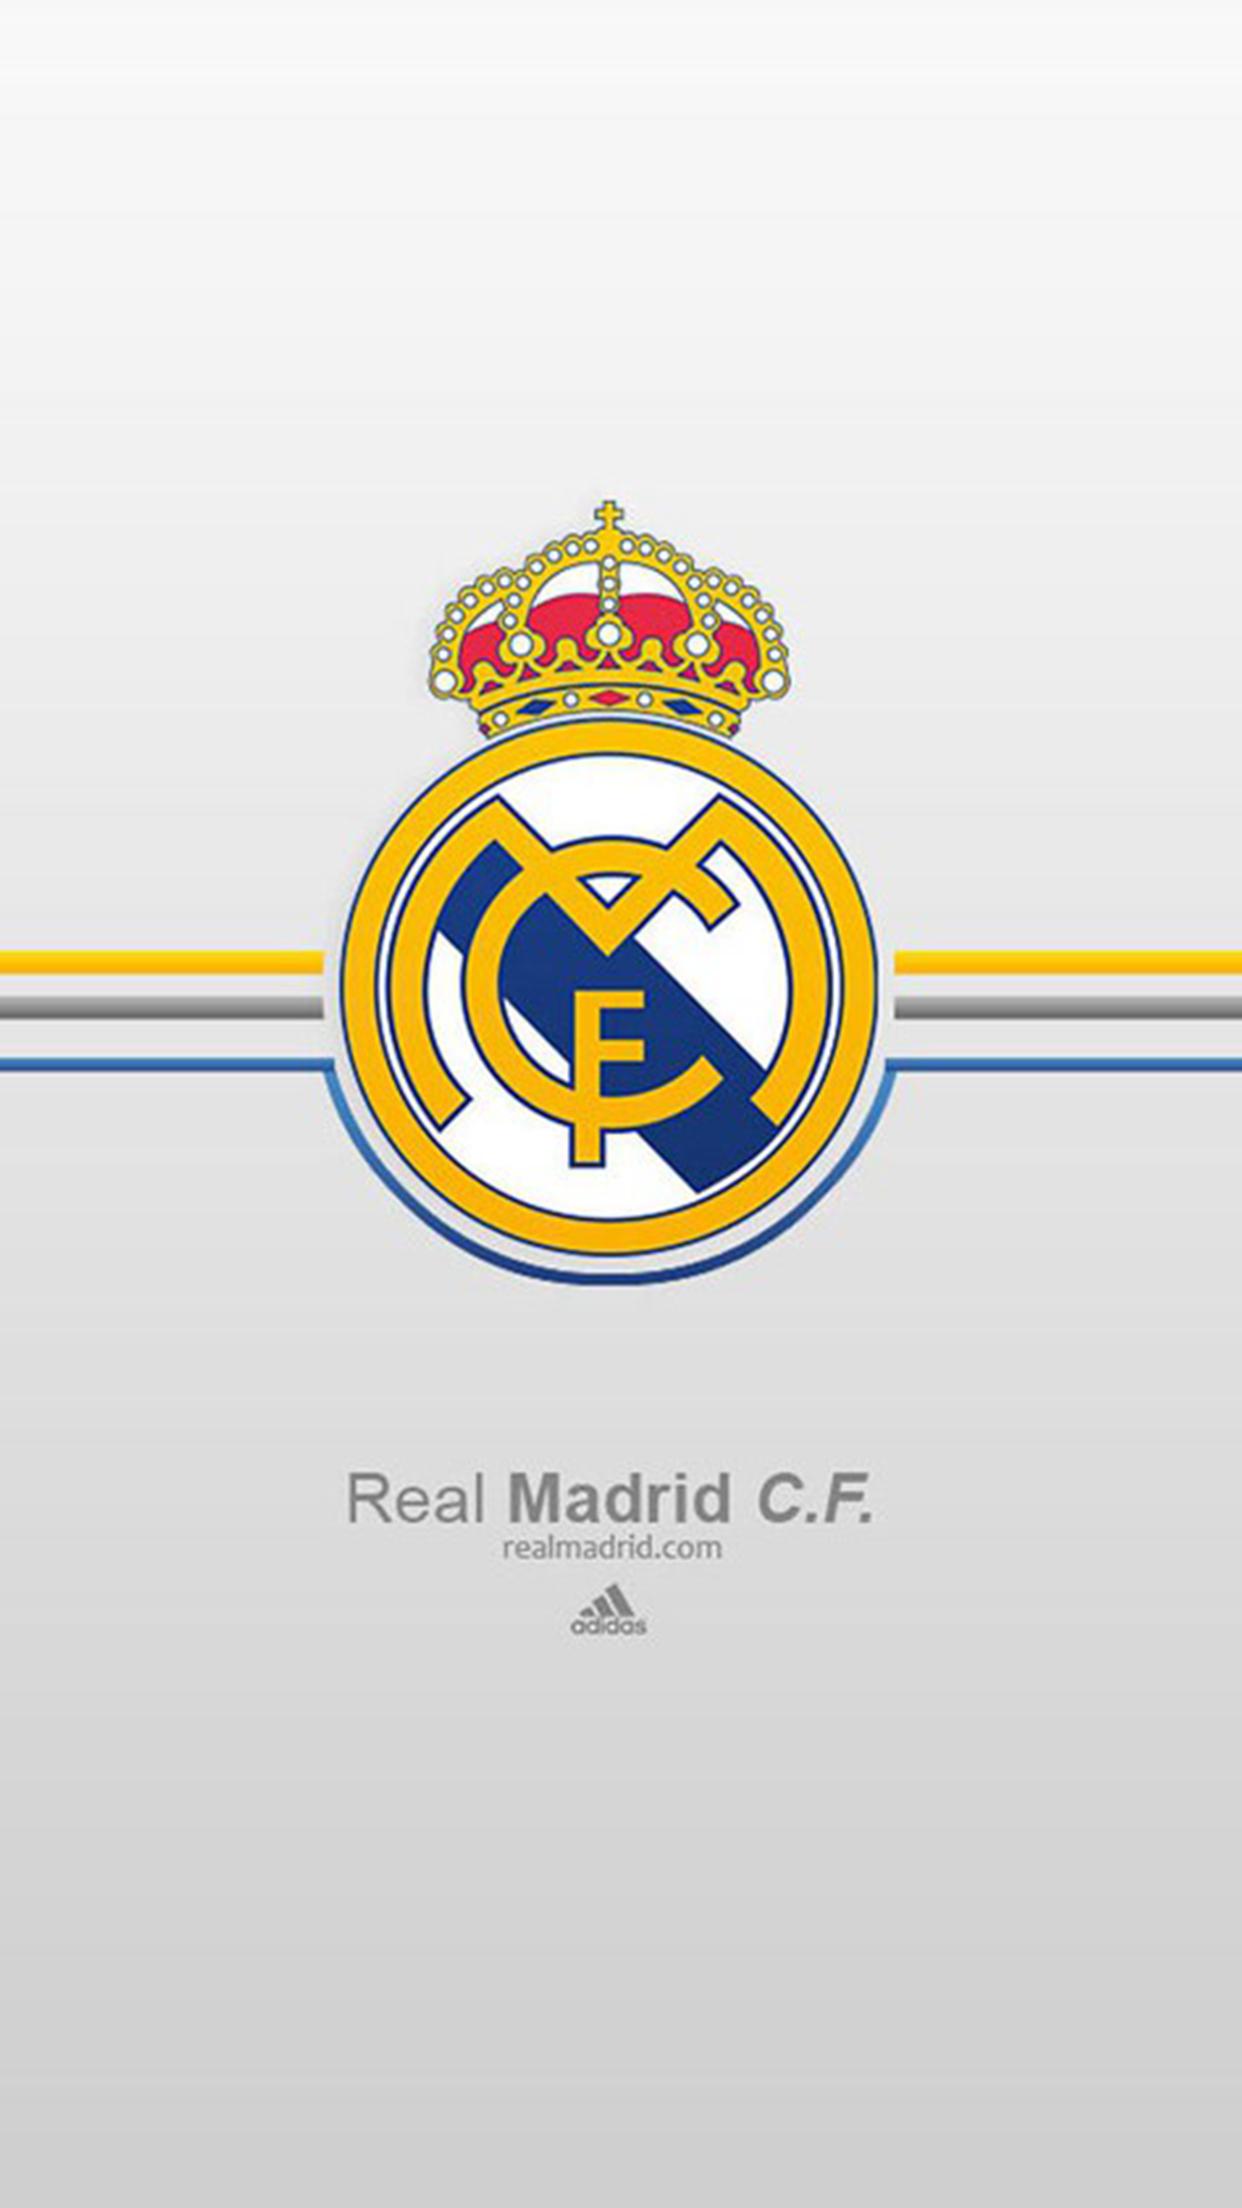 Real Madrid Wallpapers Real Madrid Wallpapers Real Madrid Logo Wallpapers Madrid Wallpaper